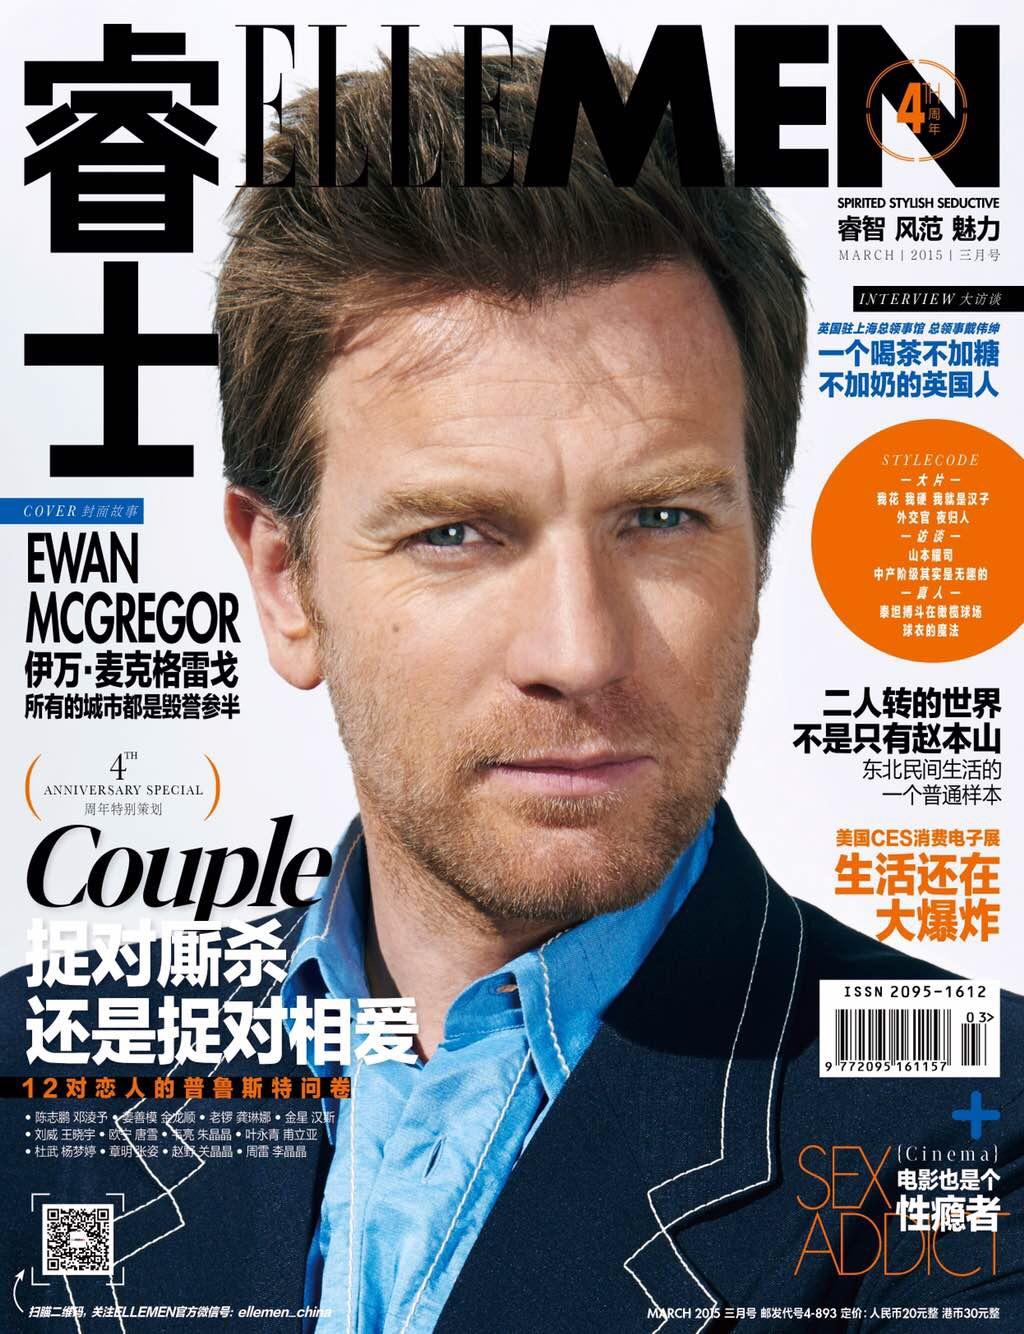 Ewan McGregor Joins the Prada Ranks